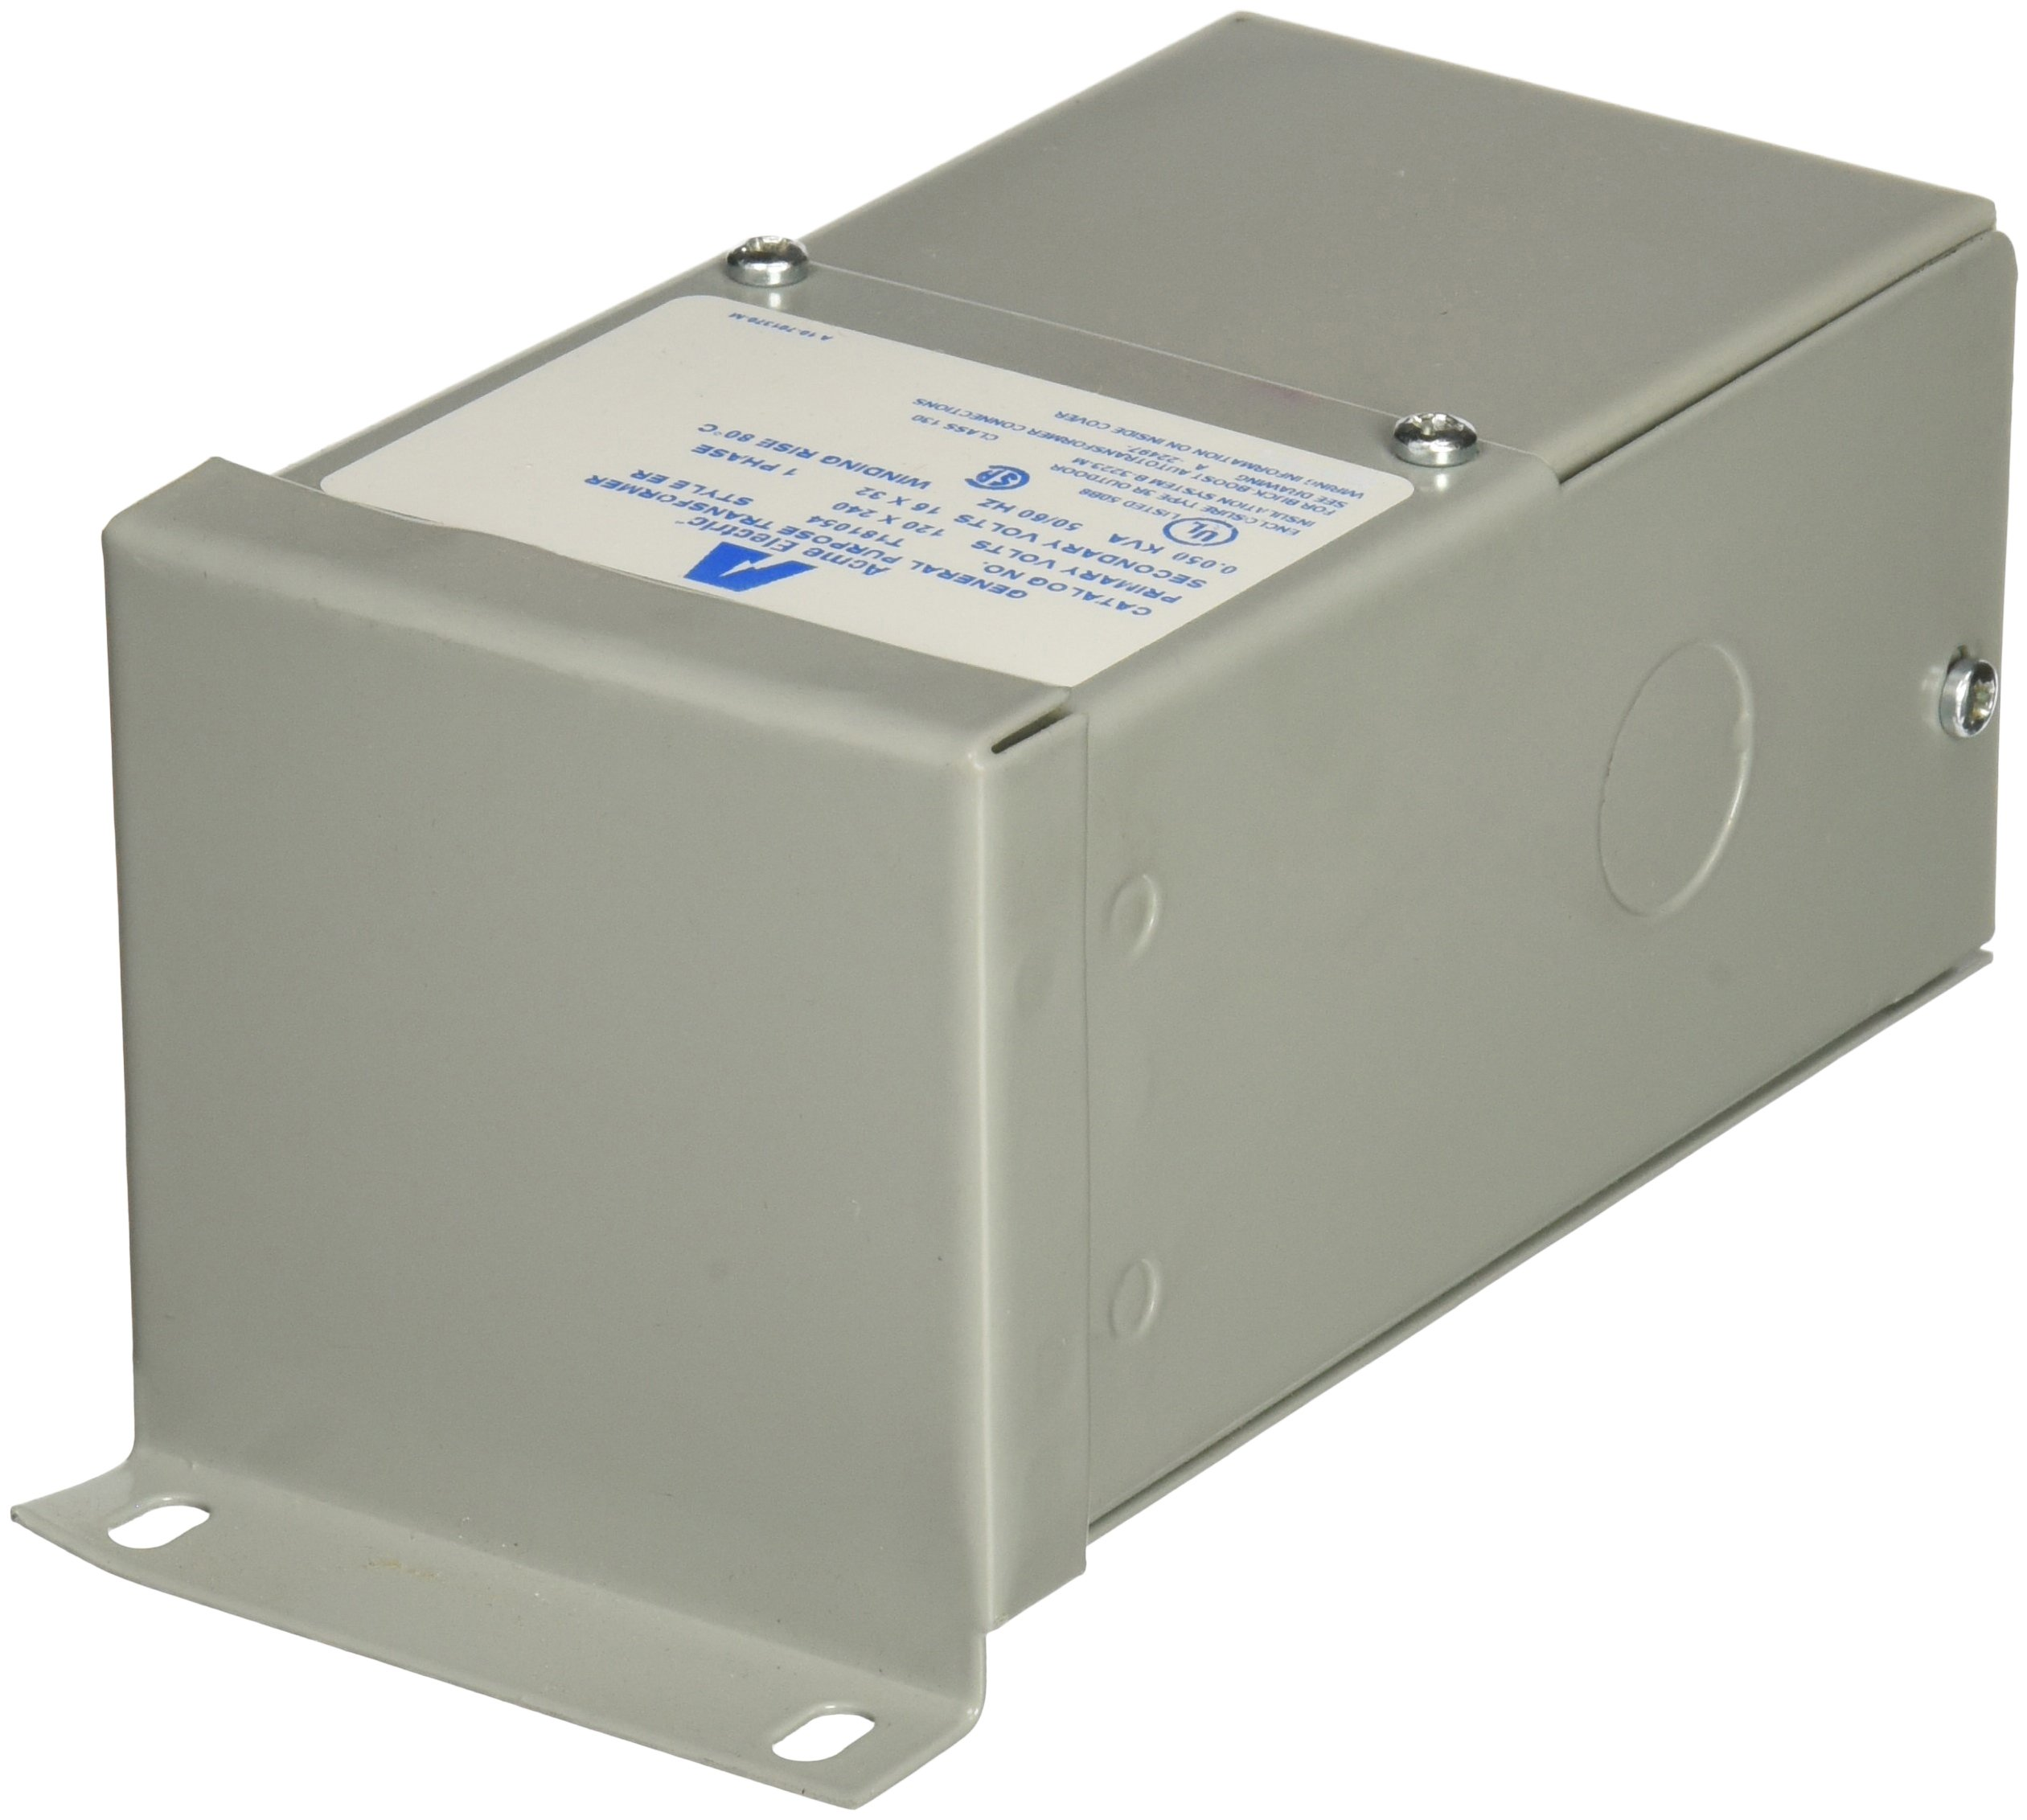 Acme Electric T181054 Open Core and Coil Industrial Control Transformer, 240V x 480V, 230V x 460V, 220V x 440V Primary Volts, 120V/115V/110V Secondary Volts, 0.5 kVA